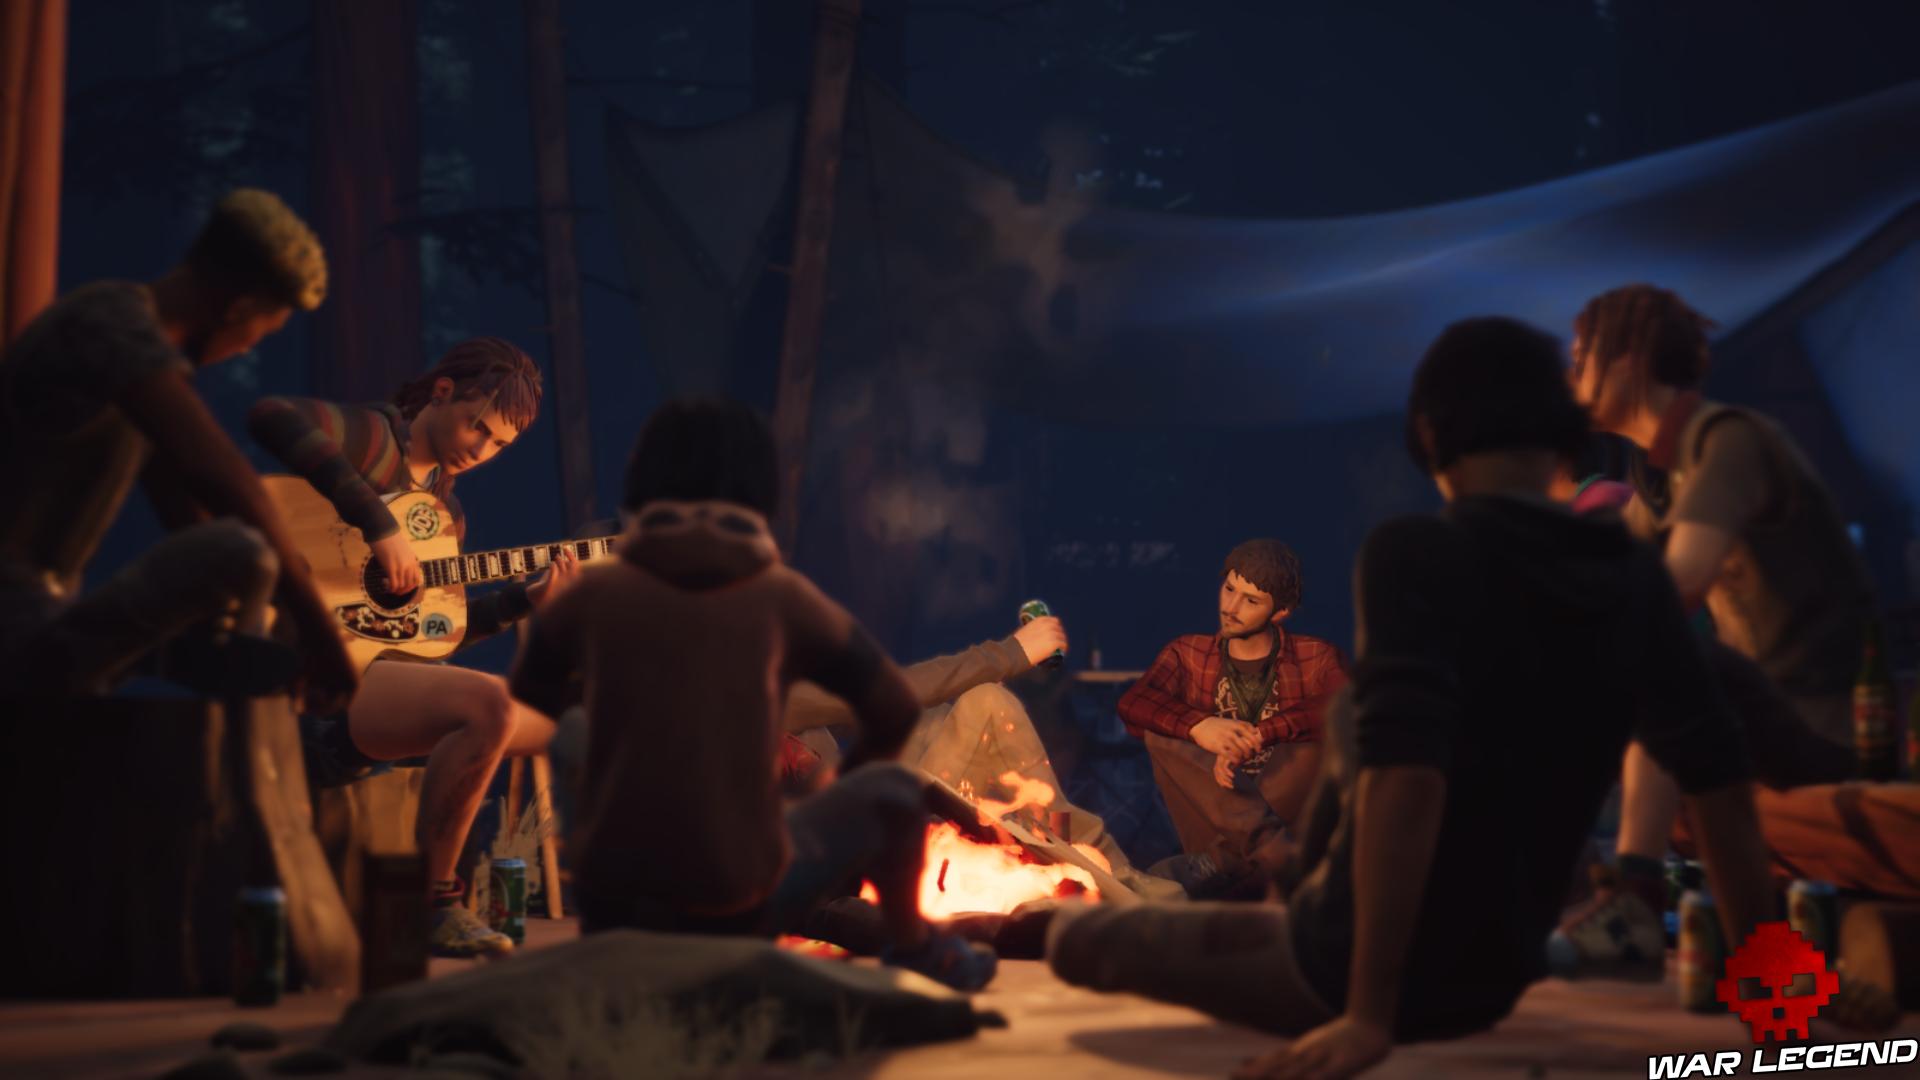 Life Is strange 2 Screenshot groupe autour du feu